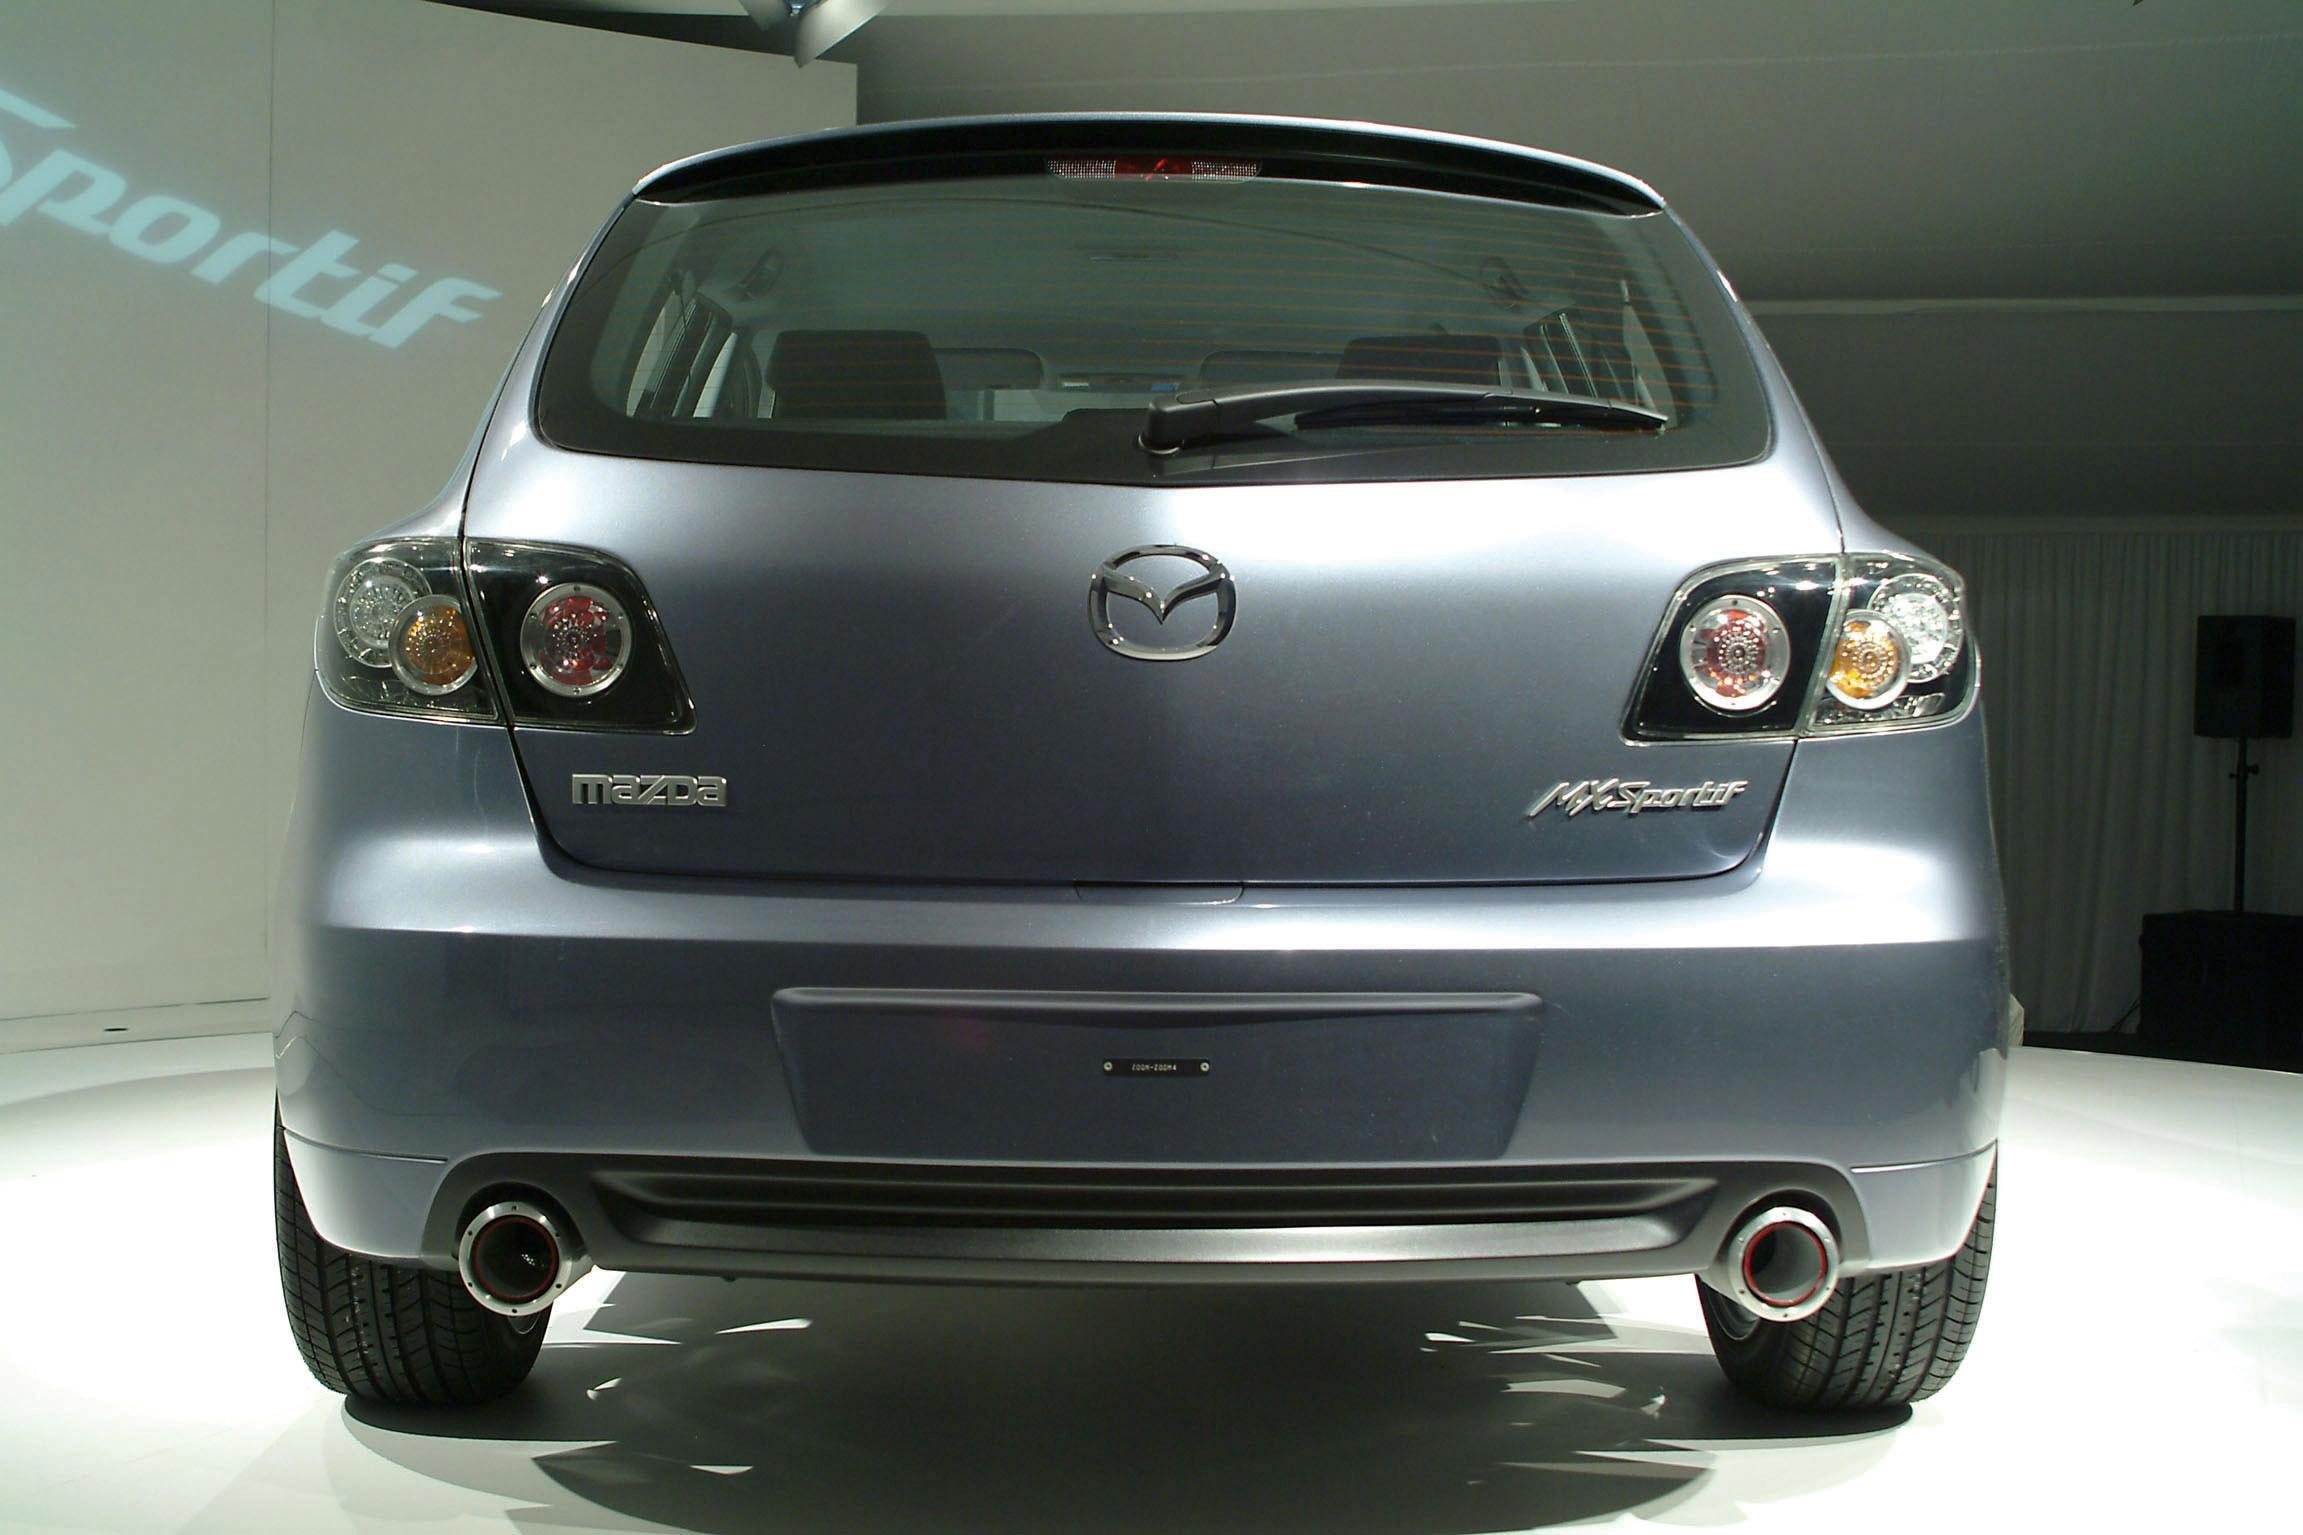 https://www.automobilesreview.com/gallery/2003-mazda-mx-sportif-concept/2003-mazda-mx-sportif-concept-20.jpg